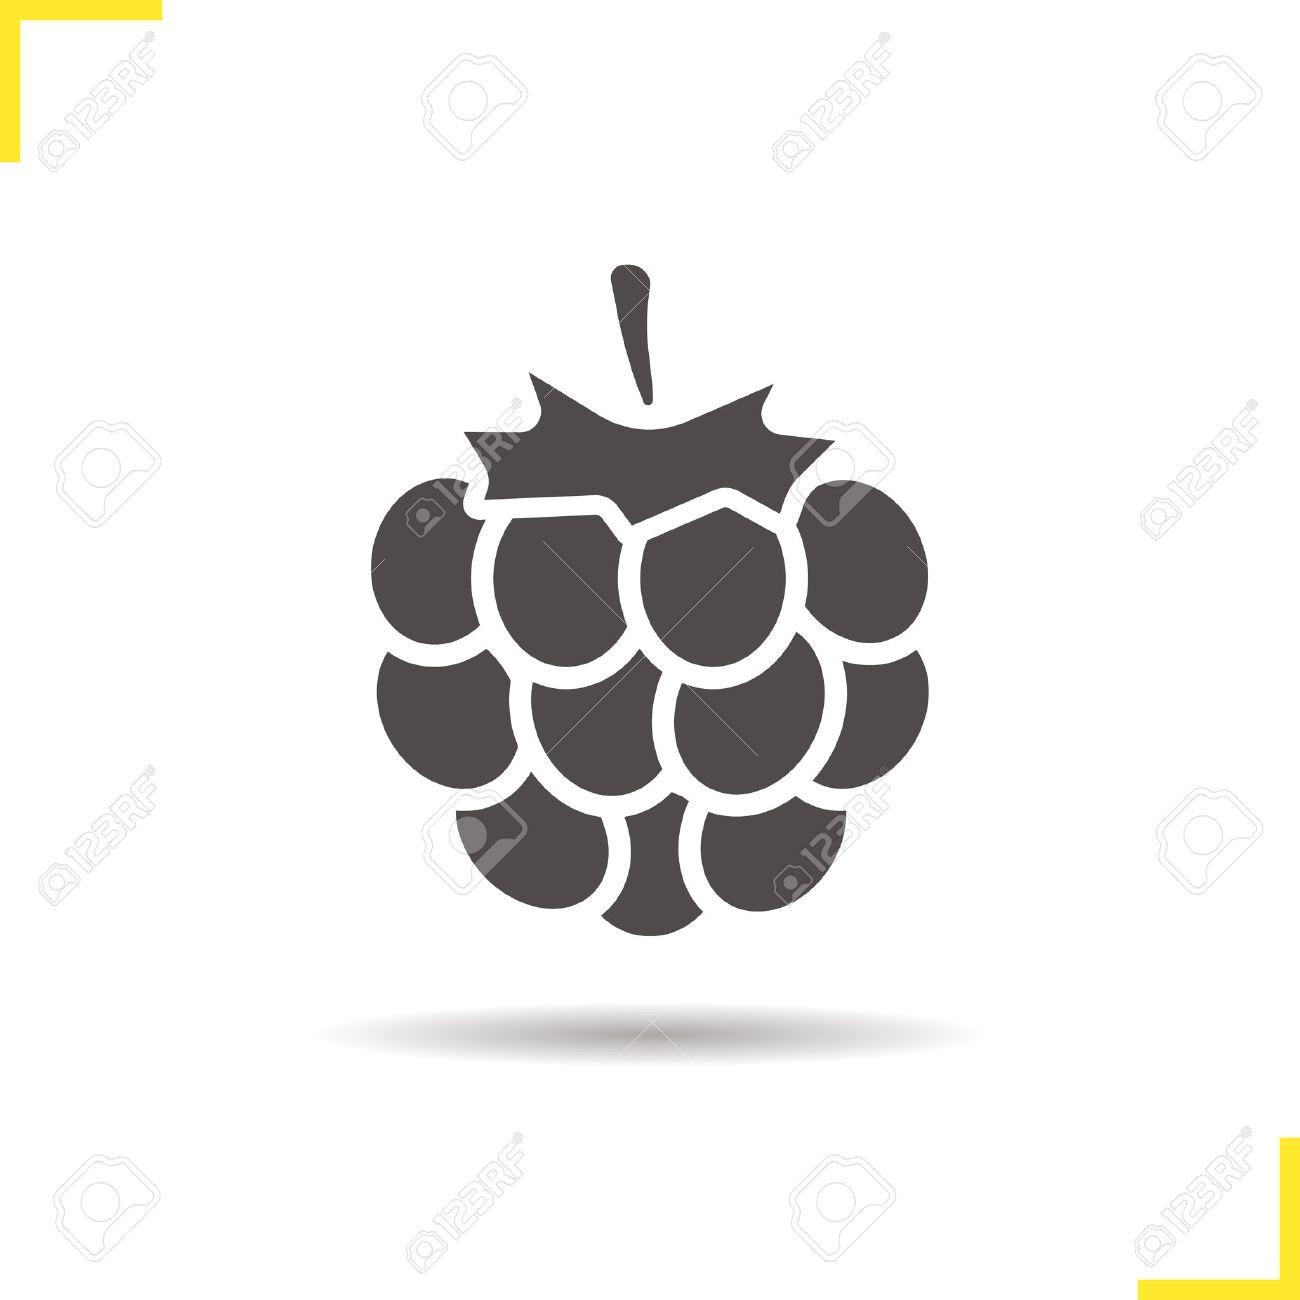 Raspberry icon. Drop shadow blackberry silhouette symbol. Raspberry berry. Vector isolated illustration - 62327791